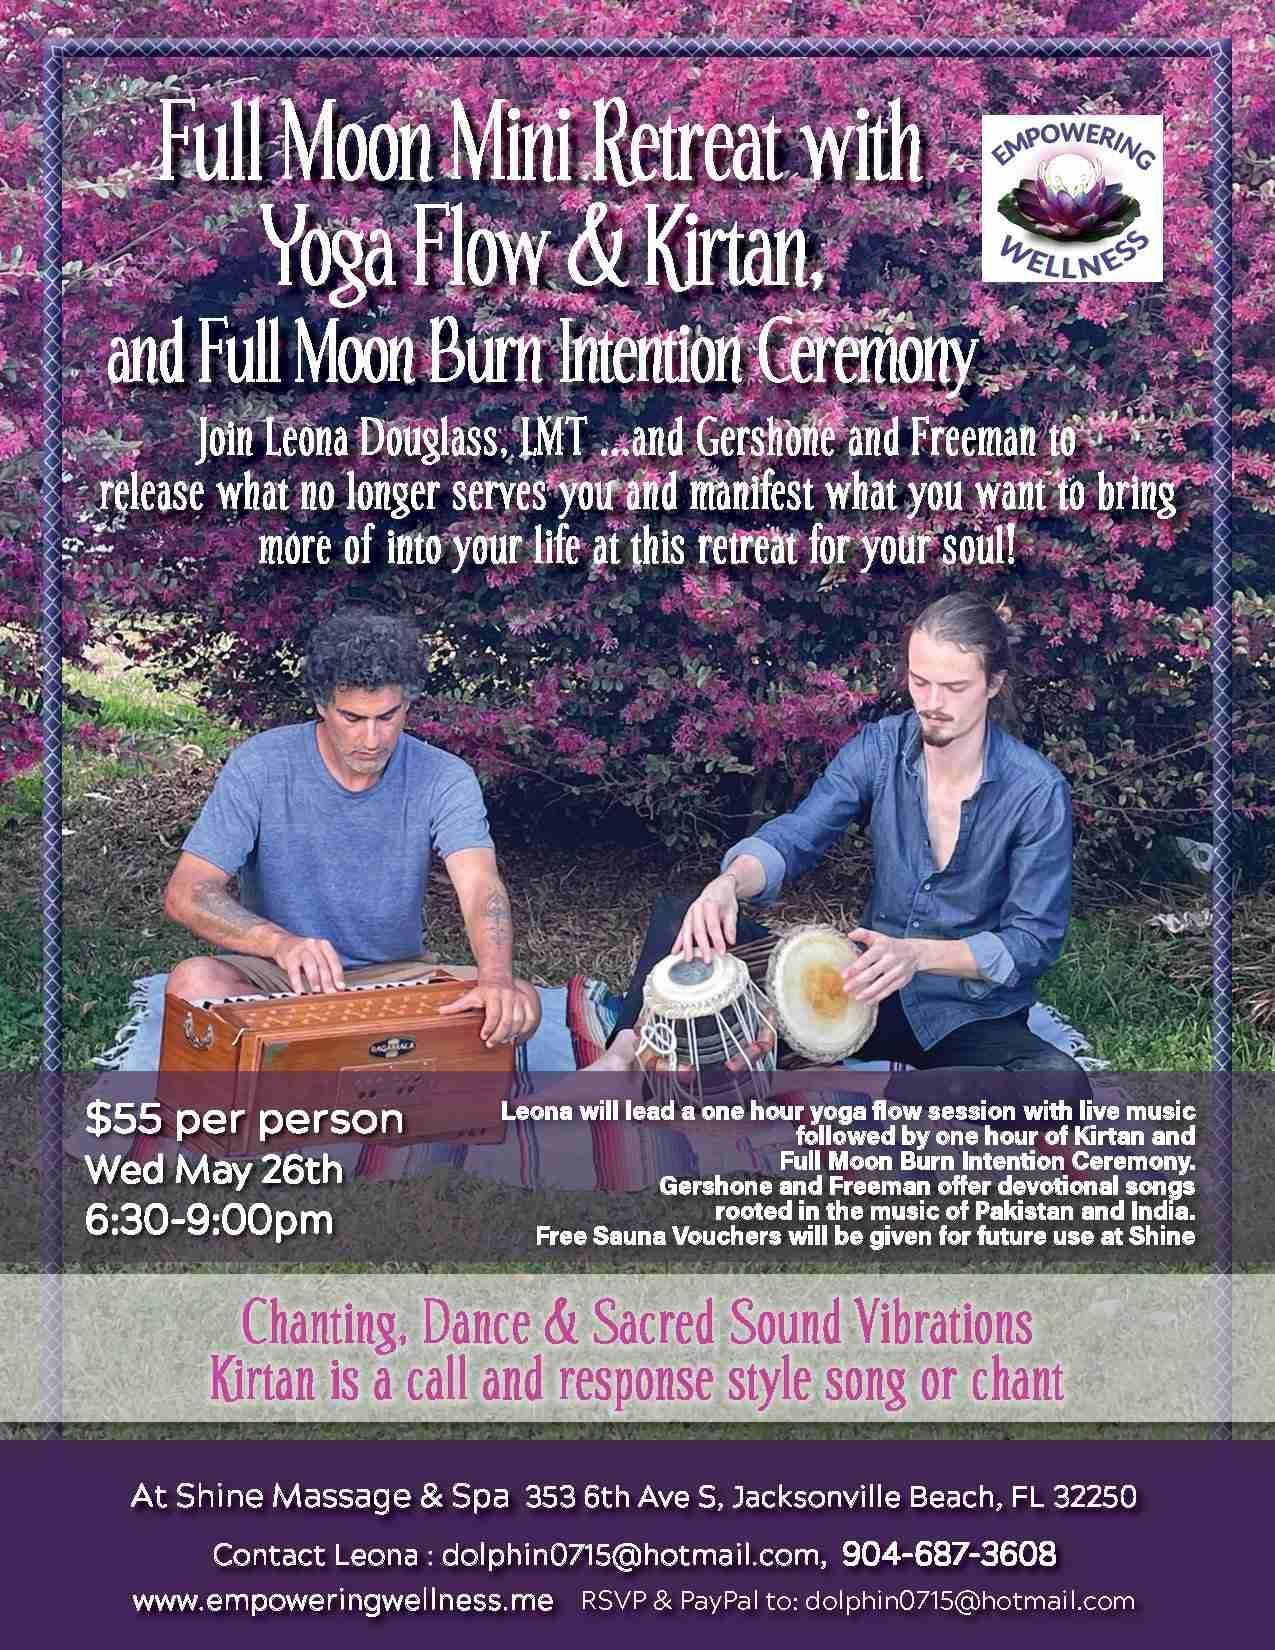 Full Moon Yoga & Kirtan EVENT